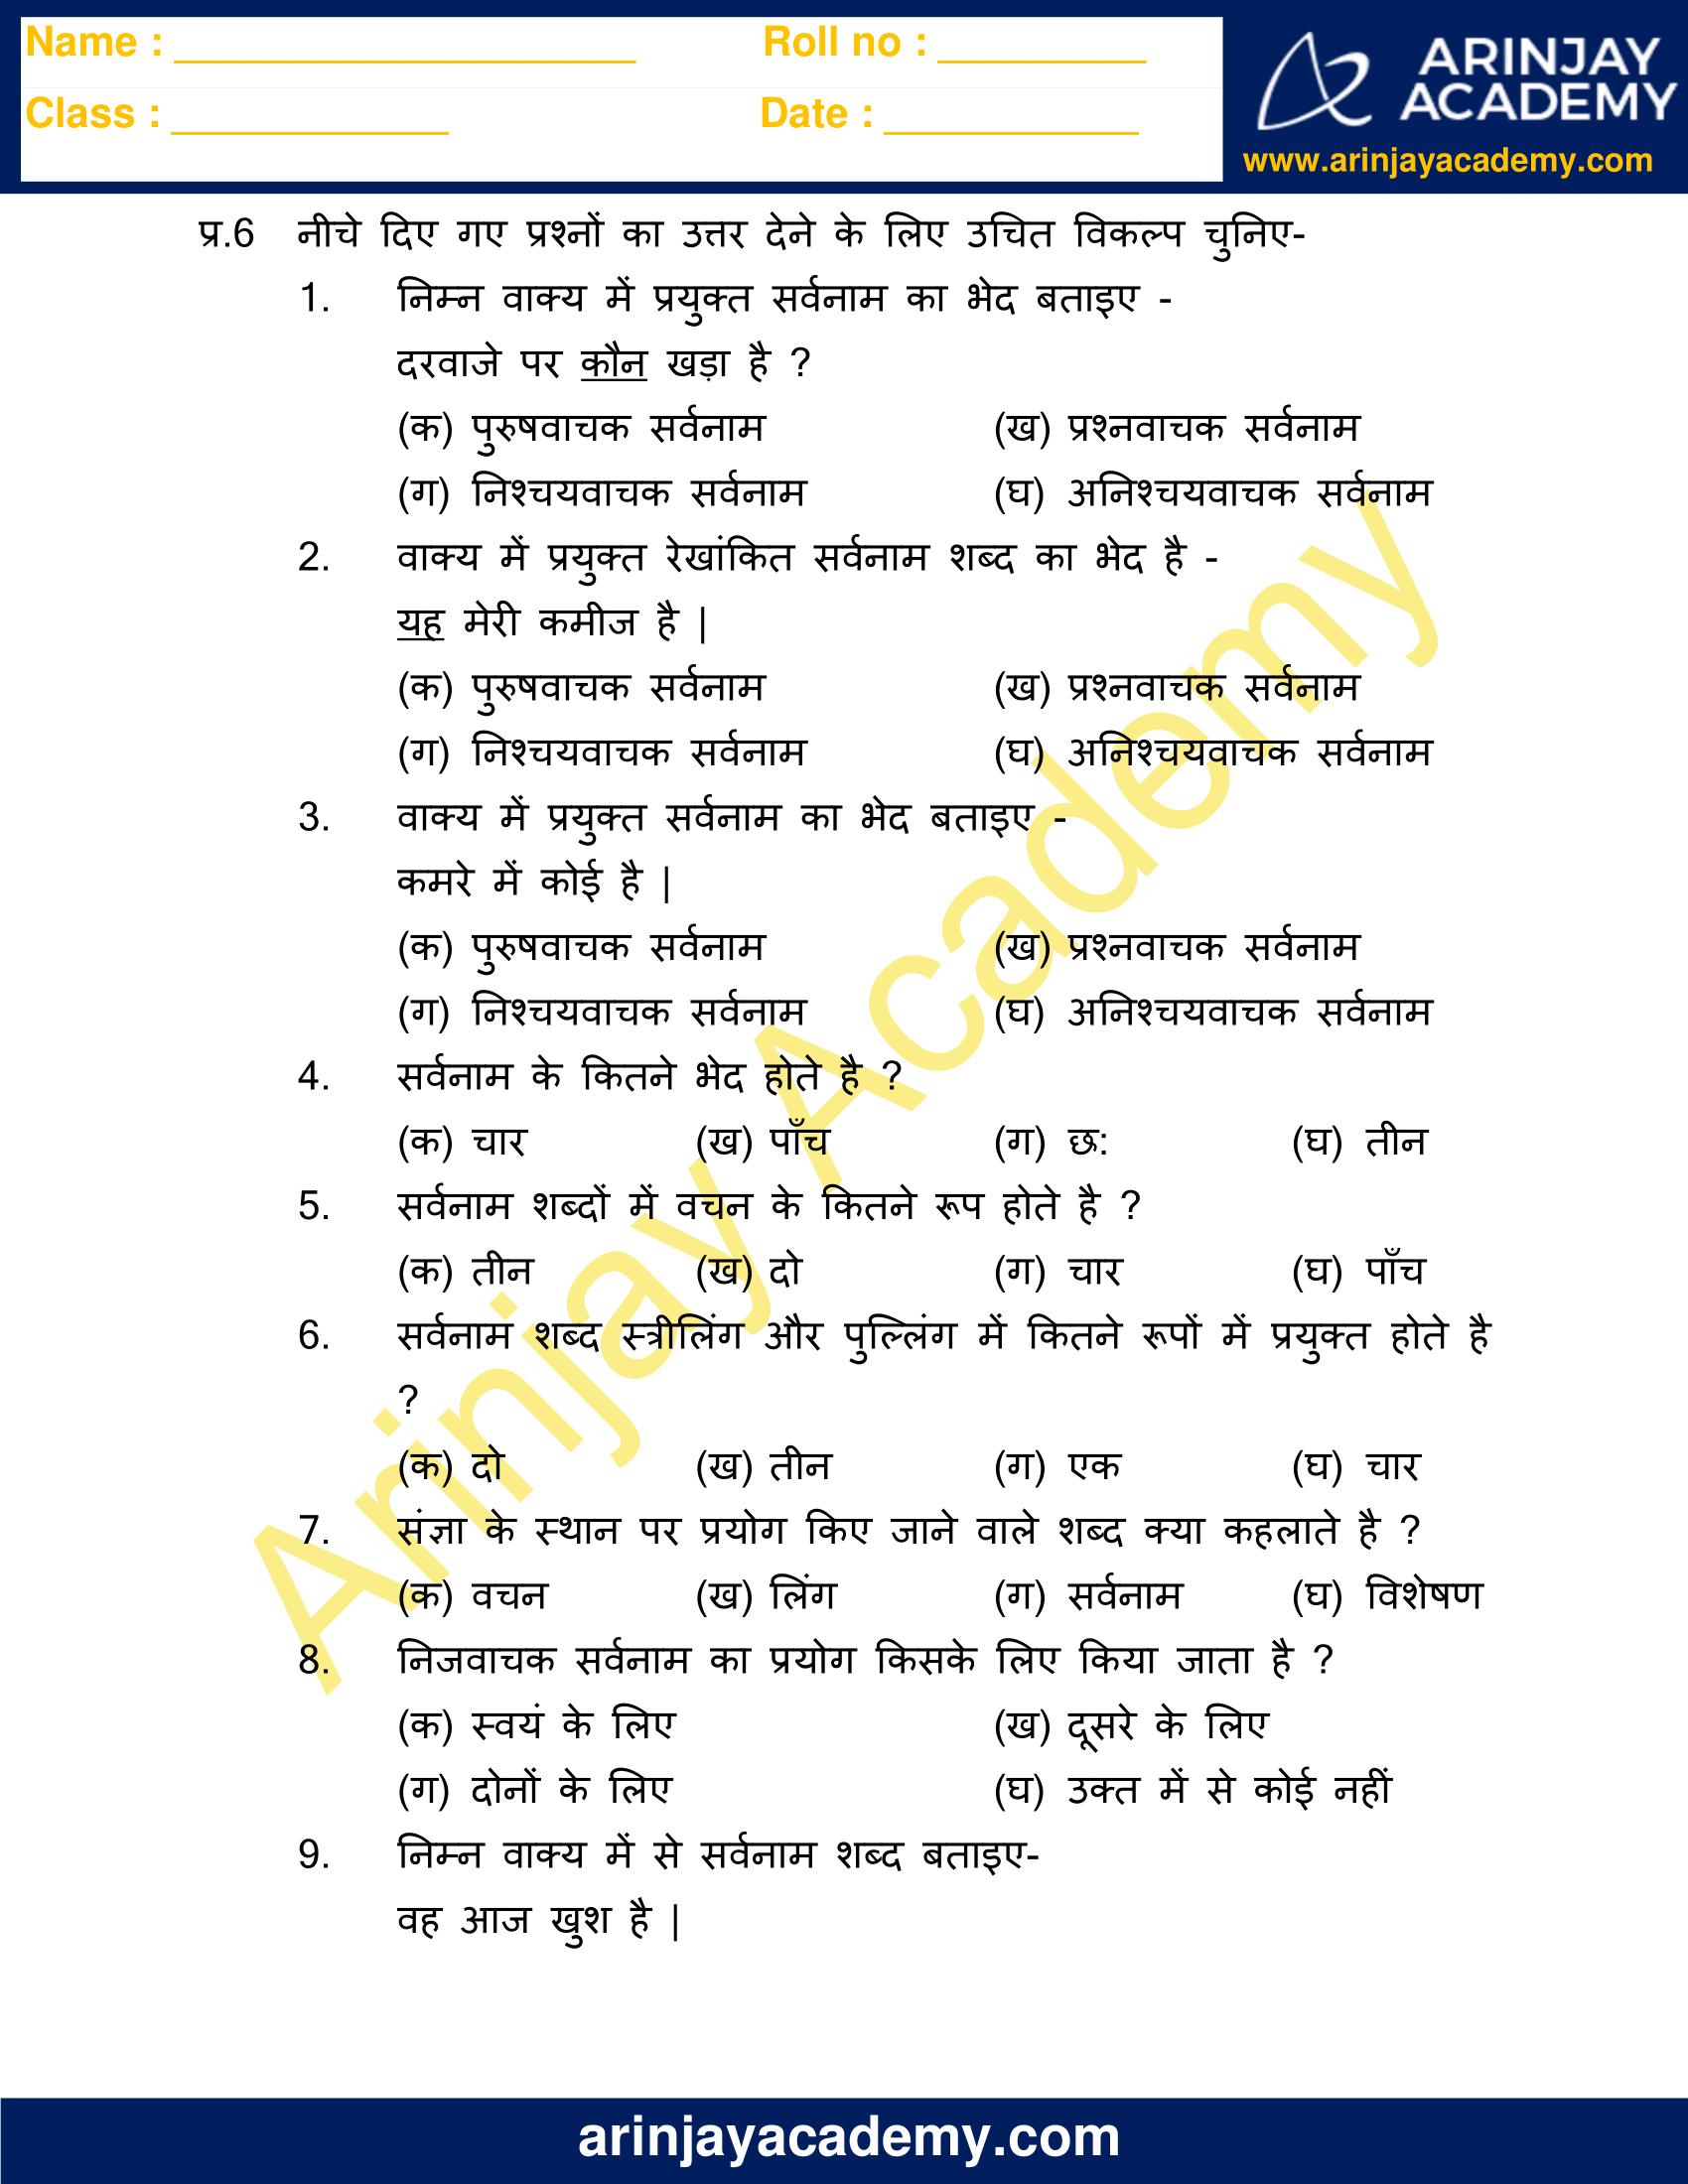 Sarvanam Worksheet for Class 4 image 5